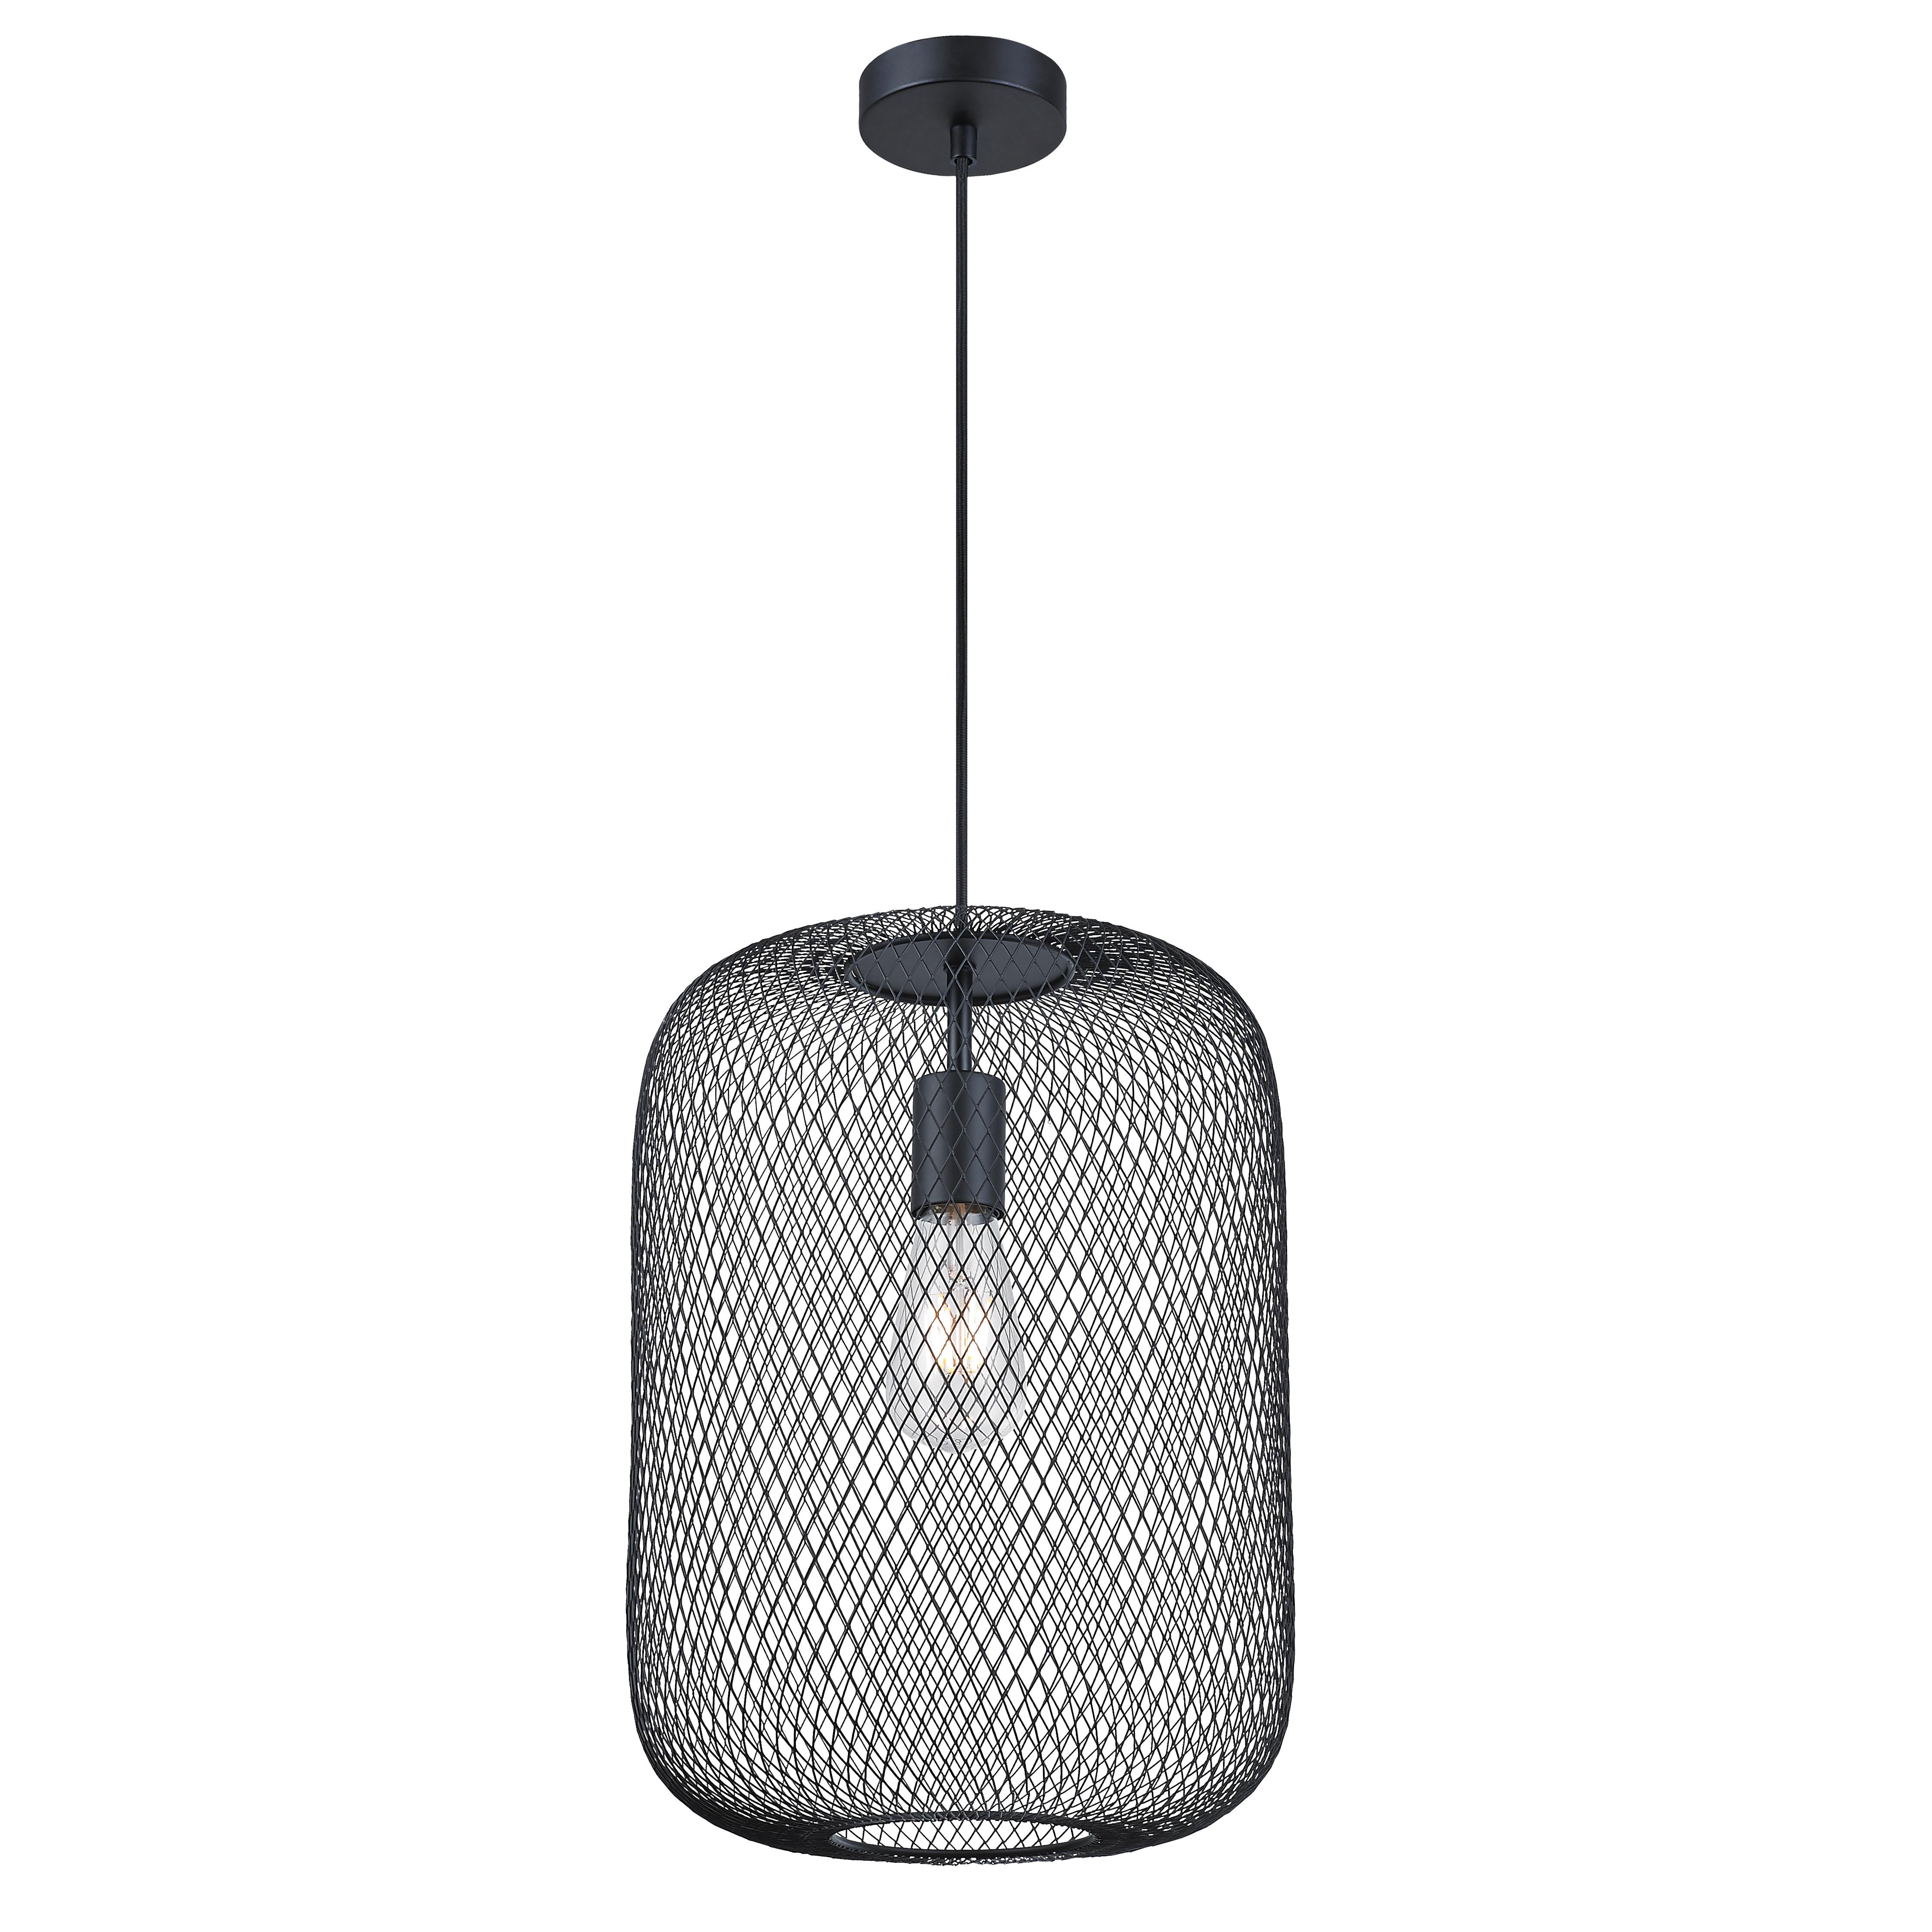 KARWEI hanglamp Juno XXL mesh zwart